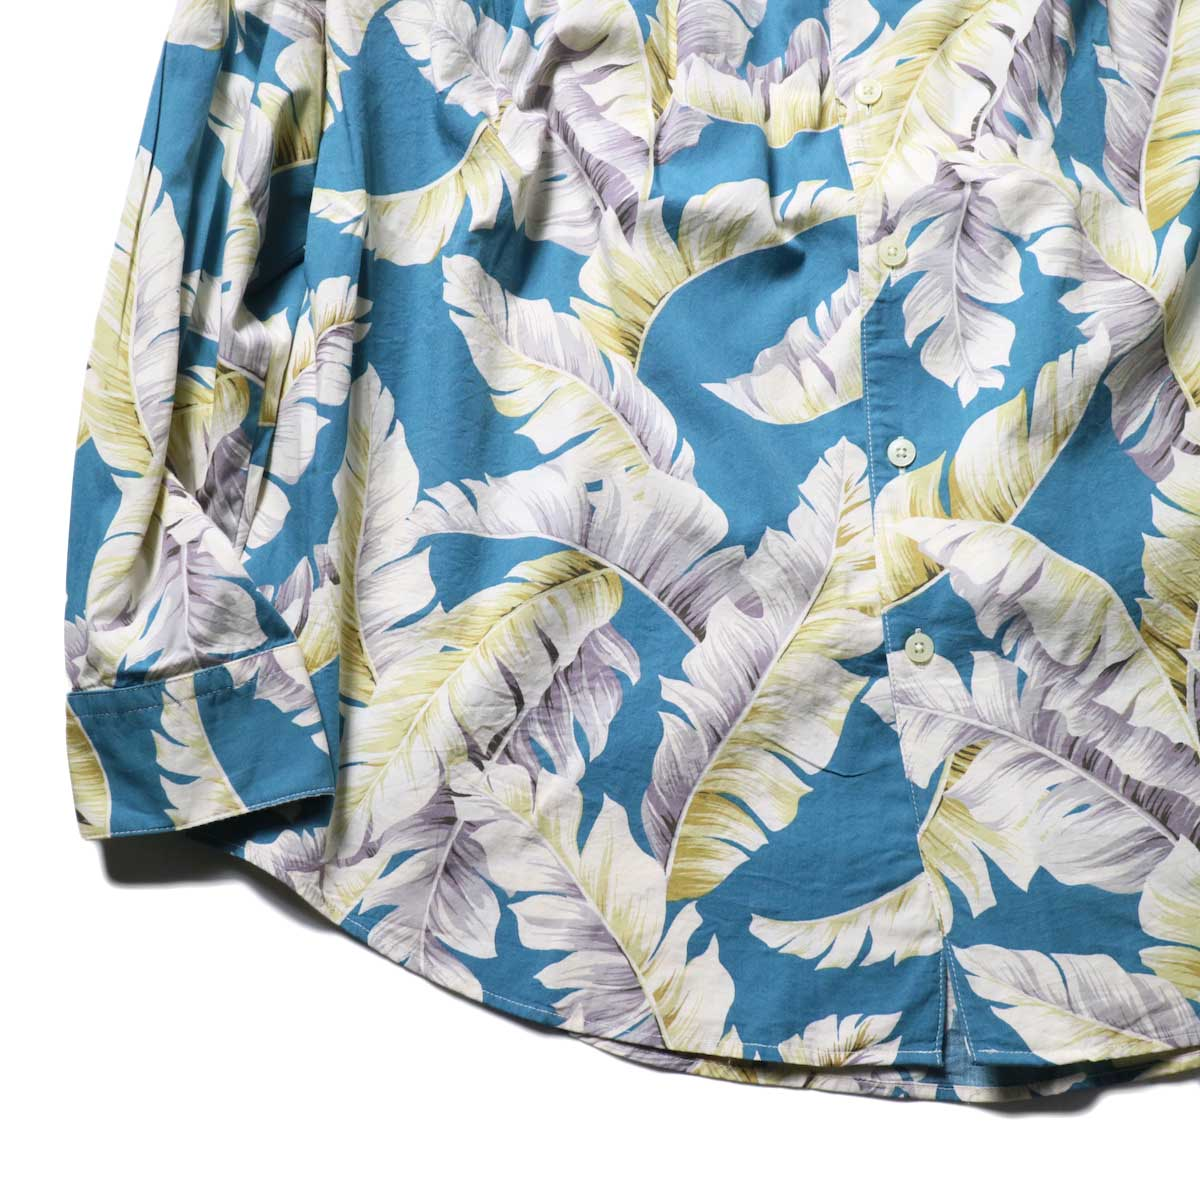 AiE / Painter Shirt - Hawaiian Print (Turquoise)袖、裾